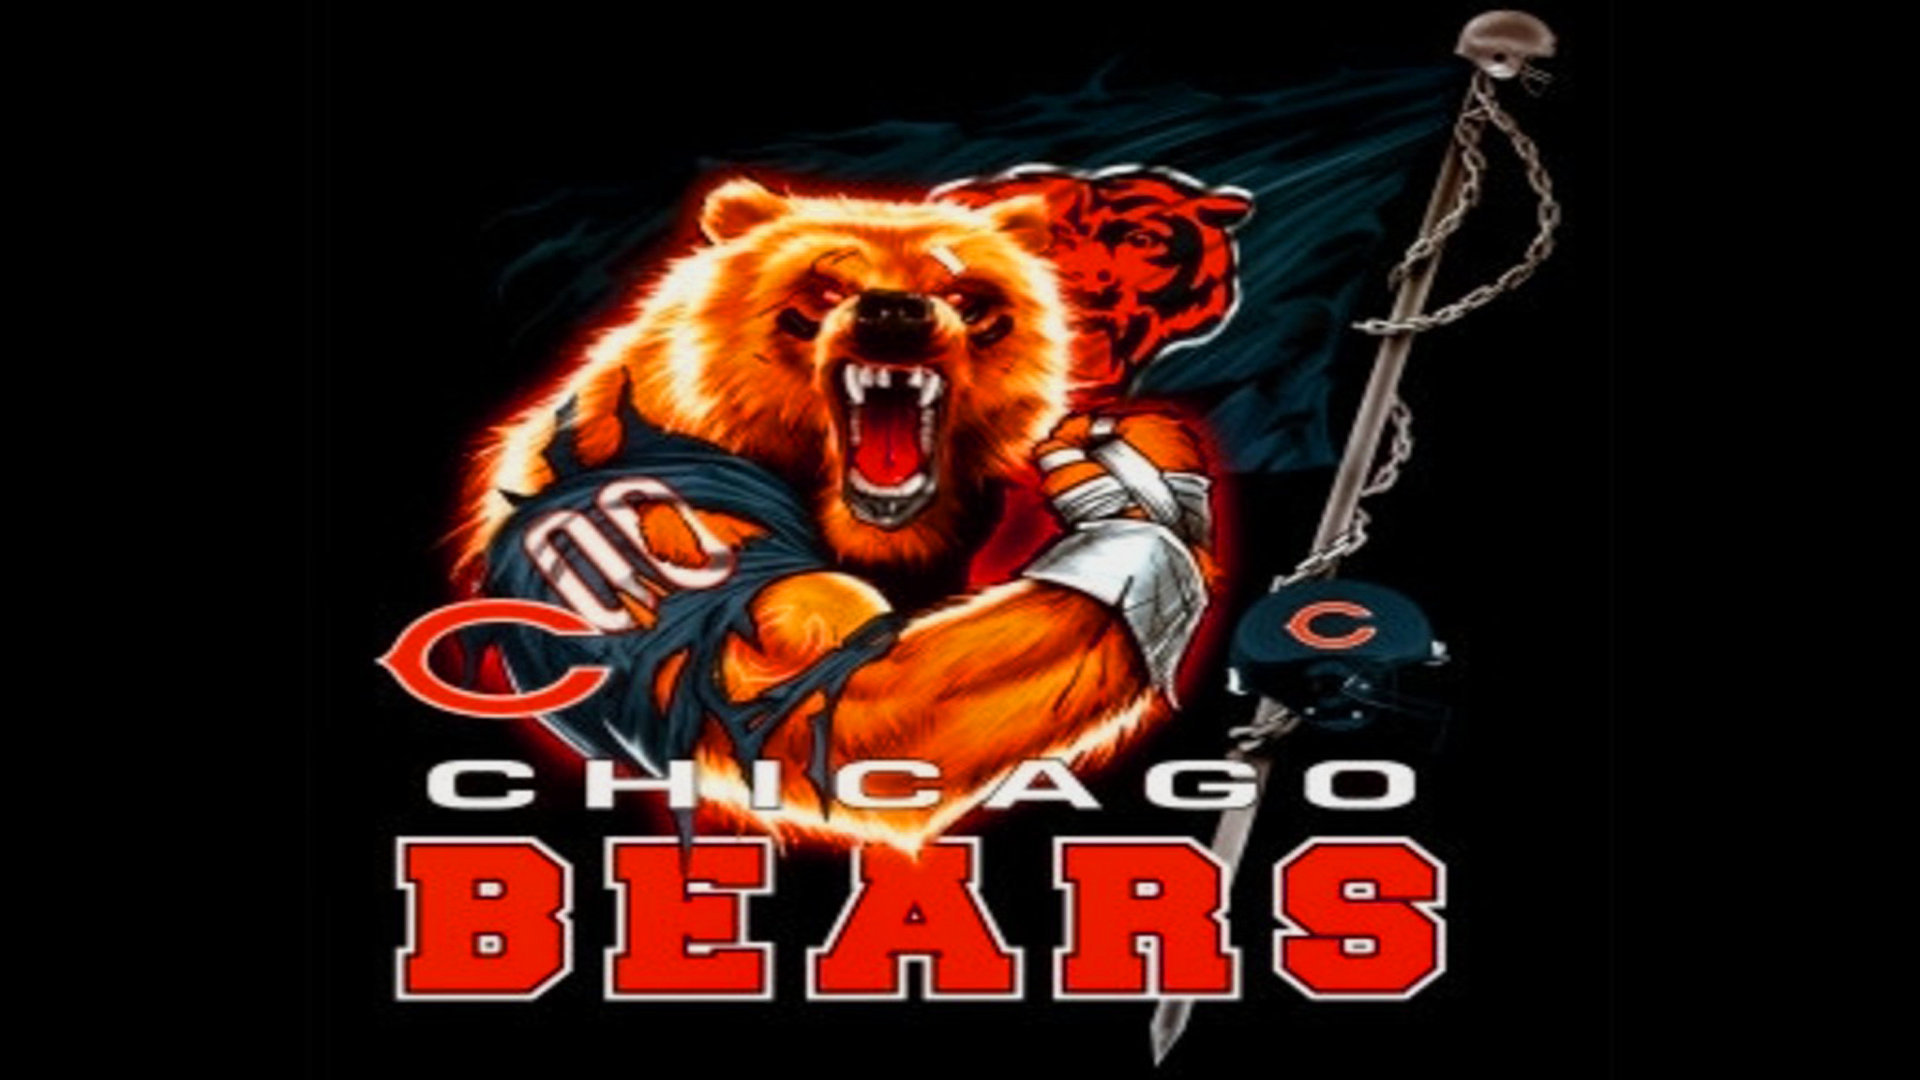 CHICAGO BEARS nfl football g wallpaper 1920x1080 156166 1920x1080